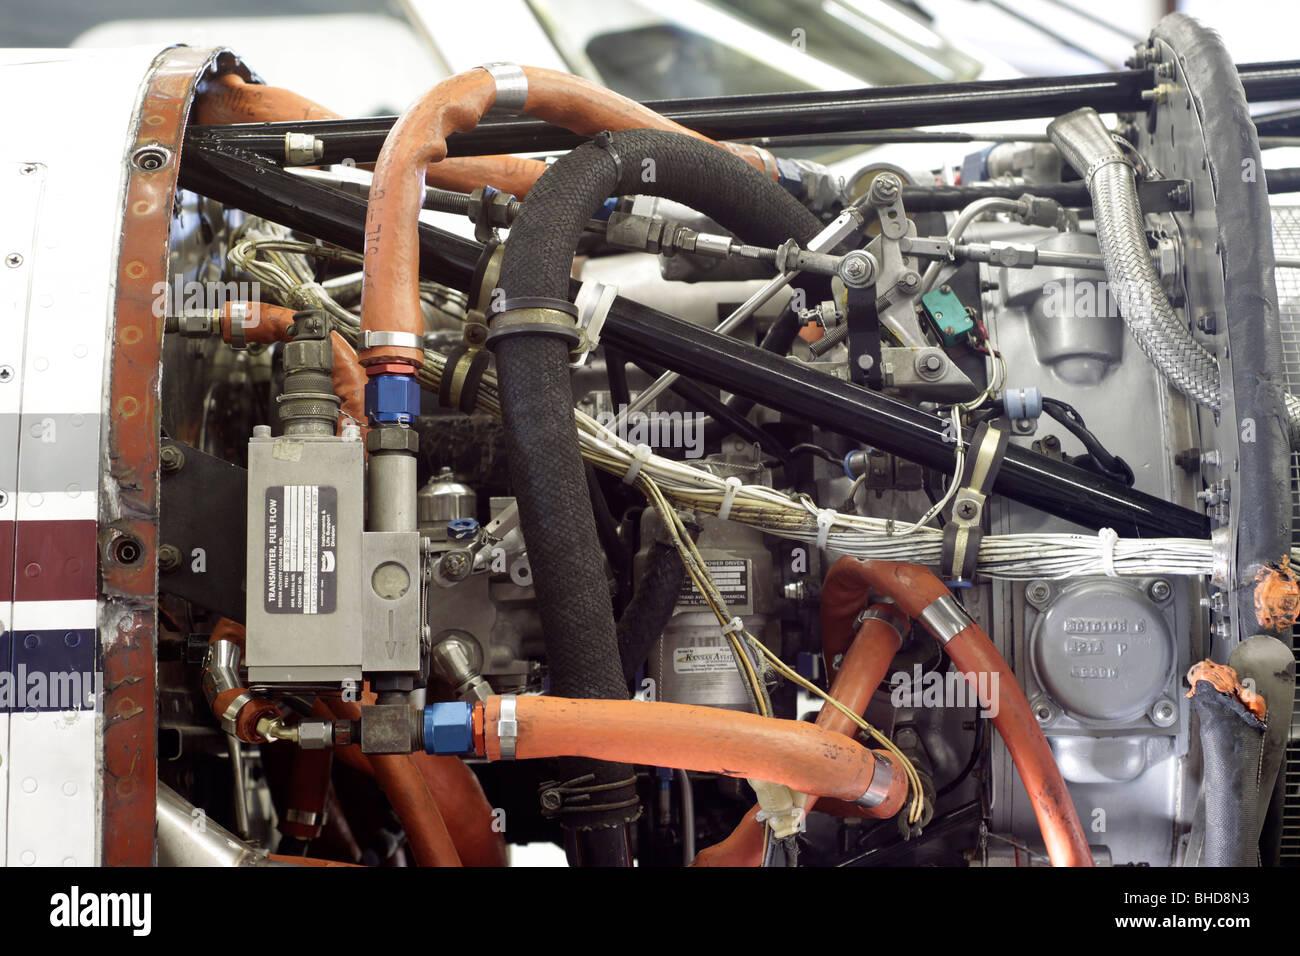 Turboprop engine - Stock Image